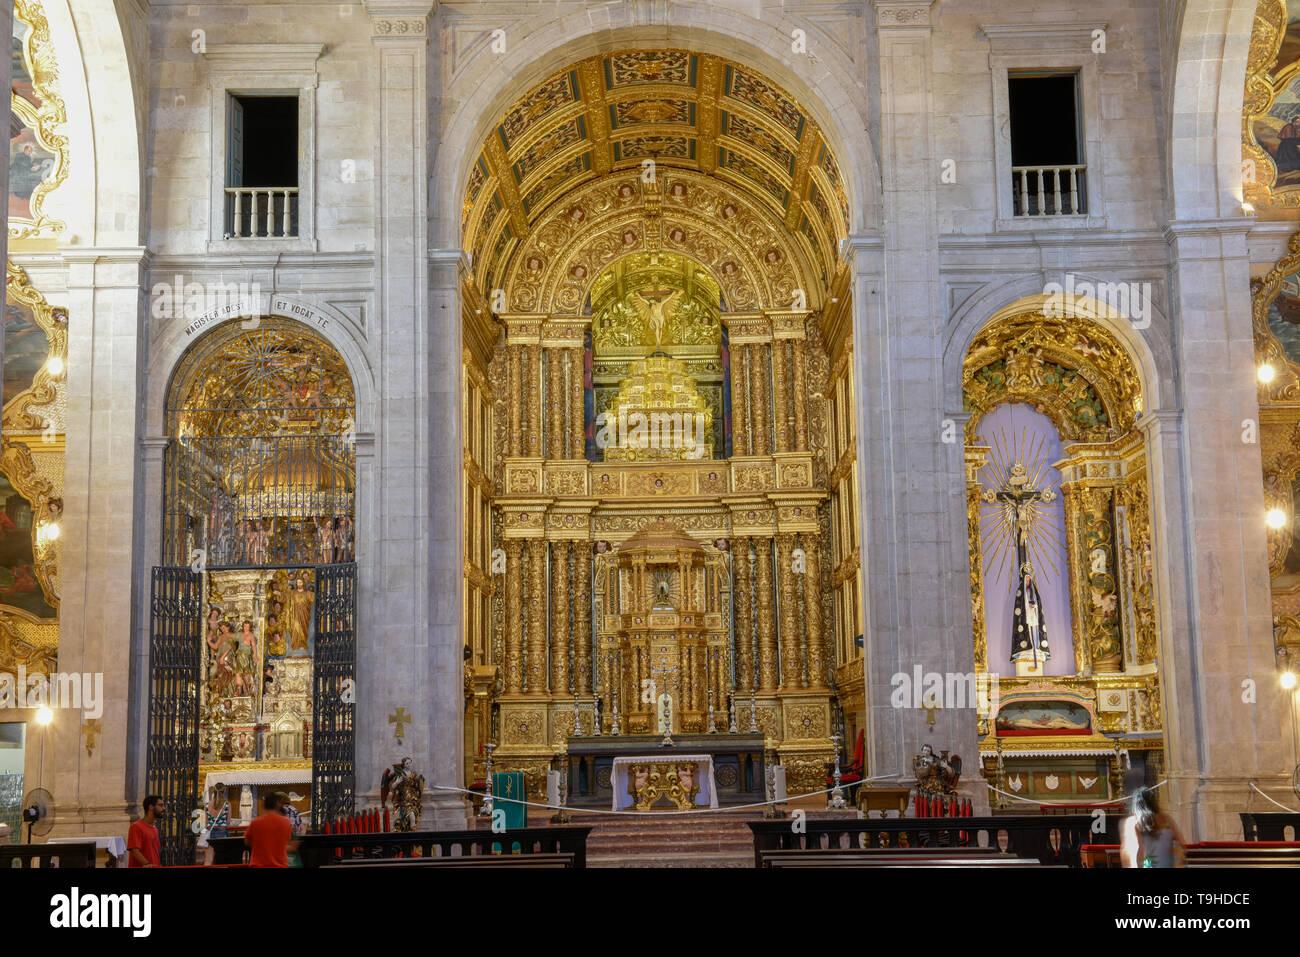 Salvador, Brazil - 3 february 2019: interior of the Cathedral Basilica of Salvador Bahia on Brazil - Stock Image